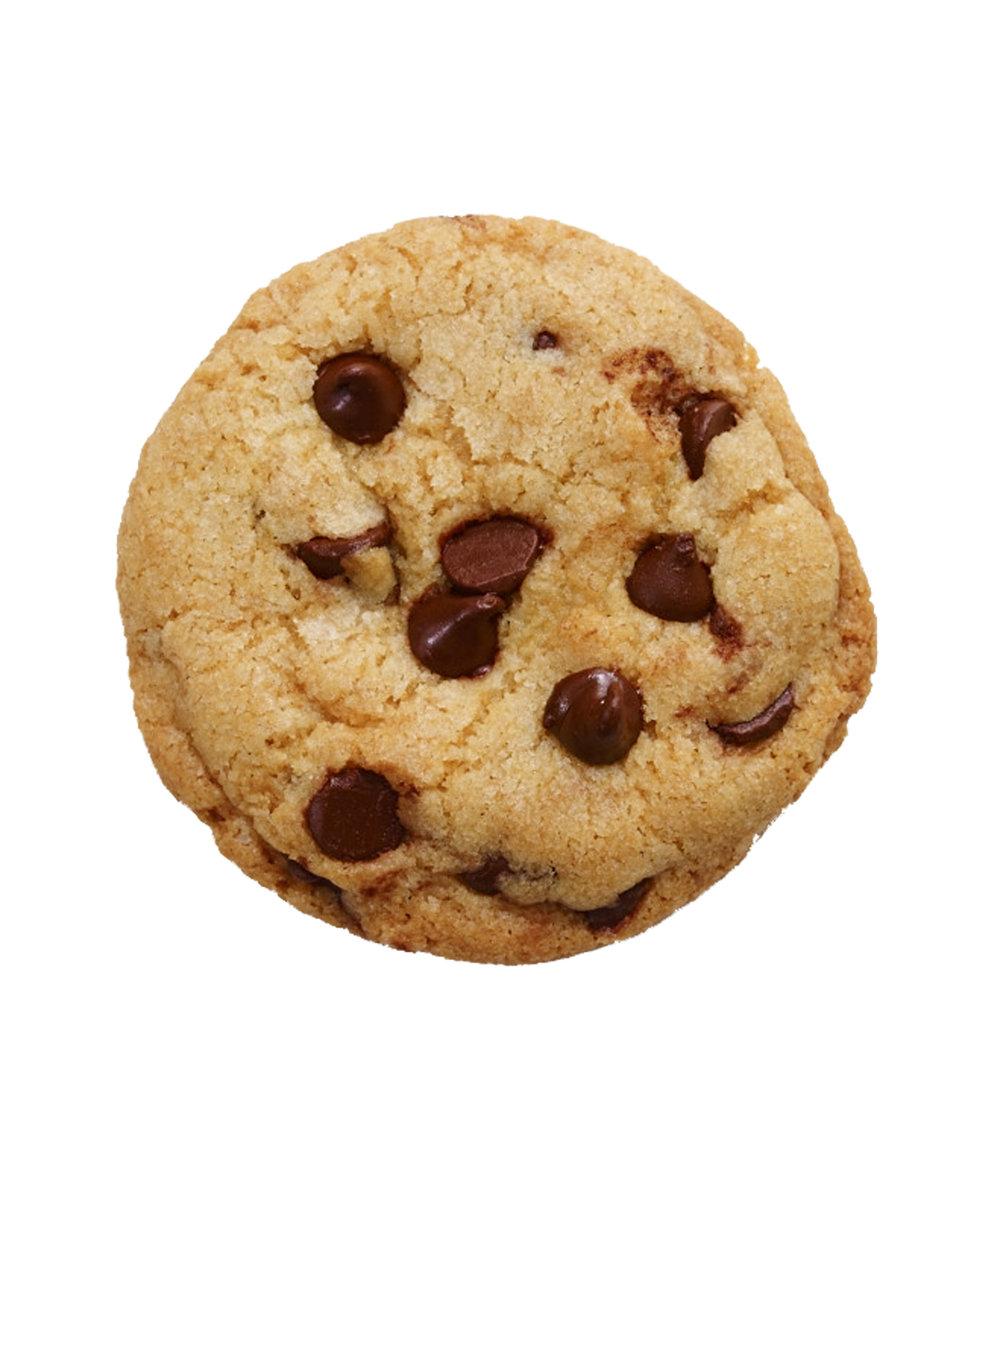 Biscuits craquants aux brisures de chocolat | ricardo